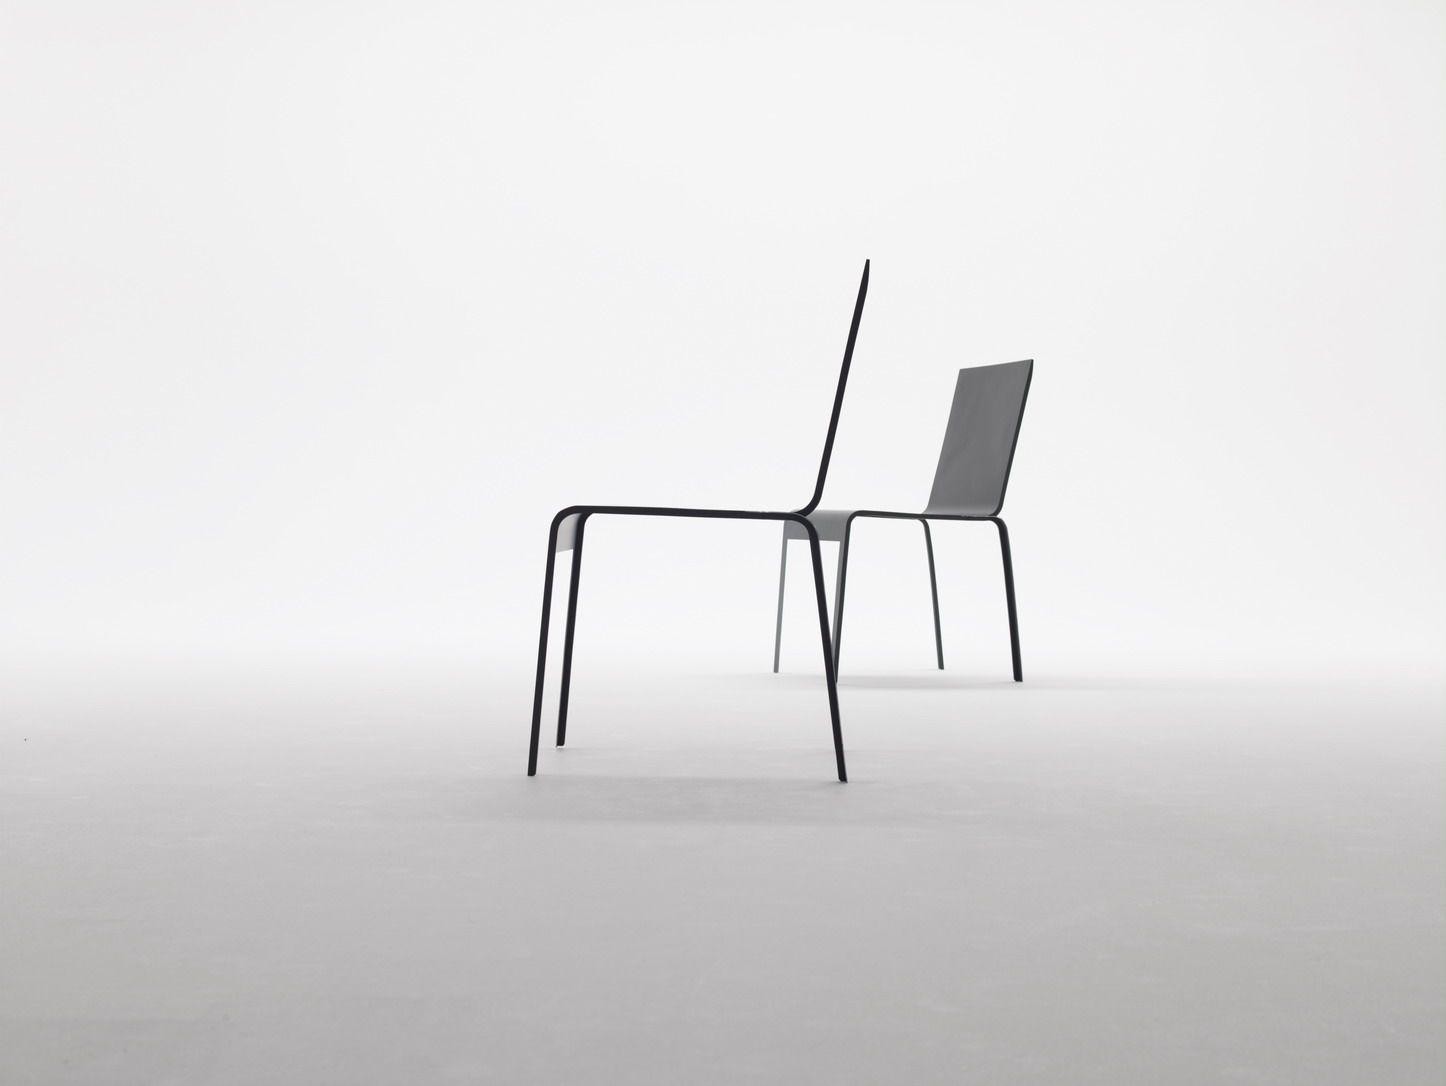 Carbon Fiber Chair Shigeru Ban Architects Carbon Fiber Chair Design Is An Attitude